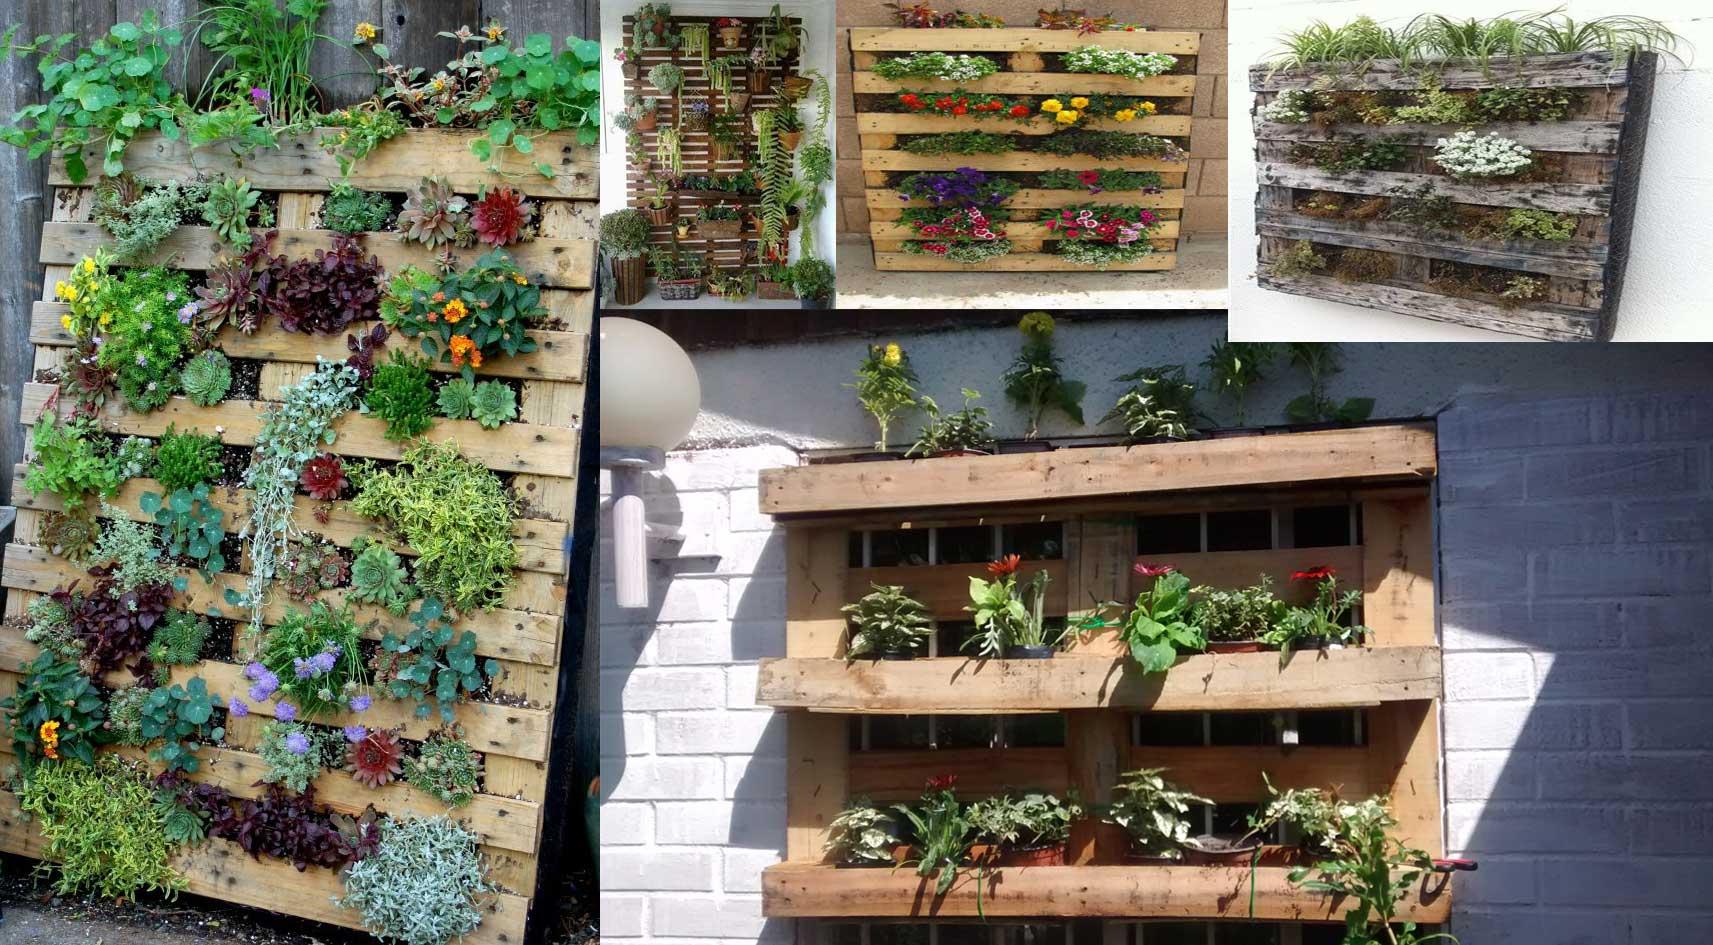 Jardineras verticales con palets Jardin vertical en palets